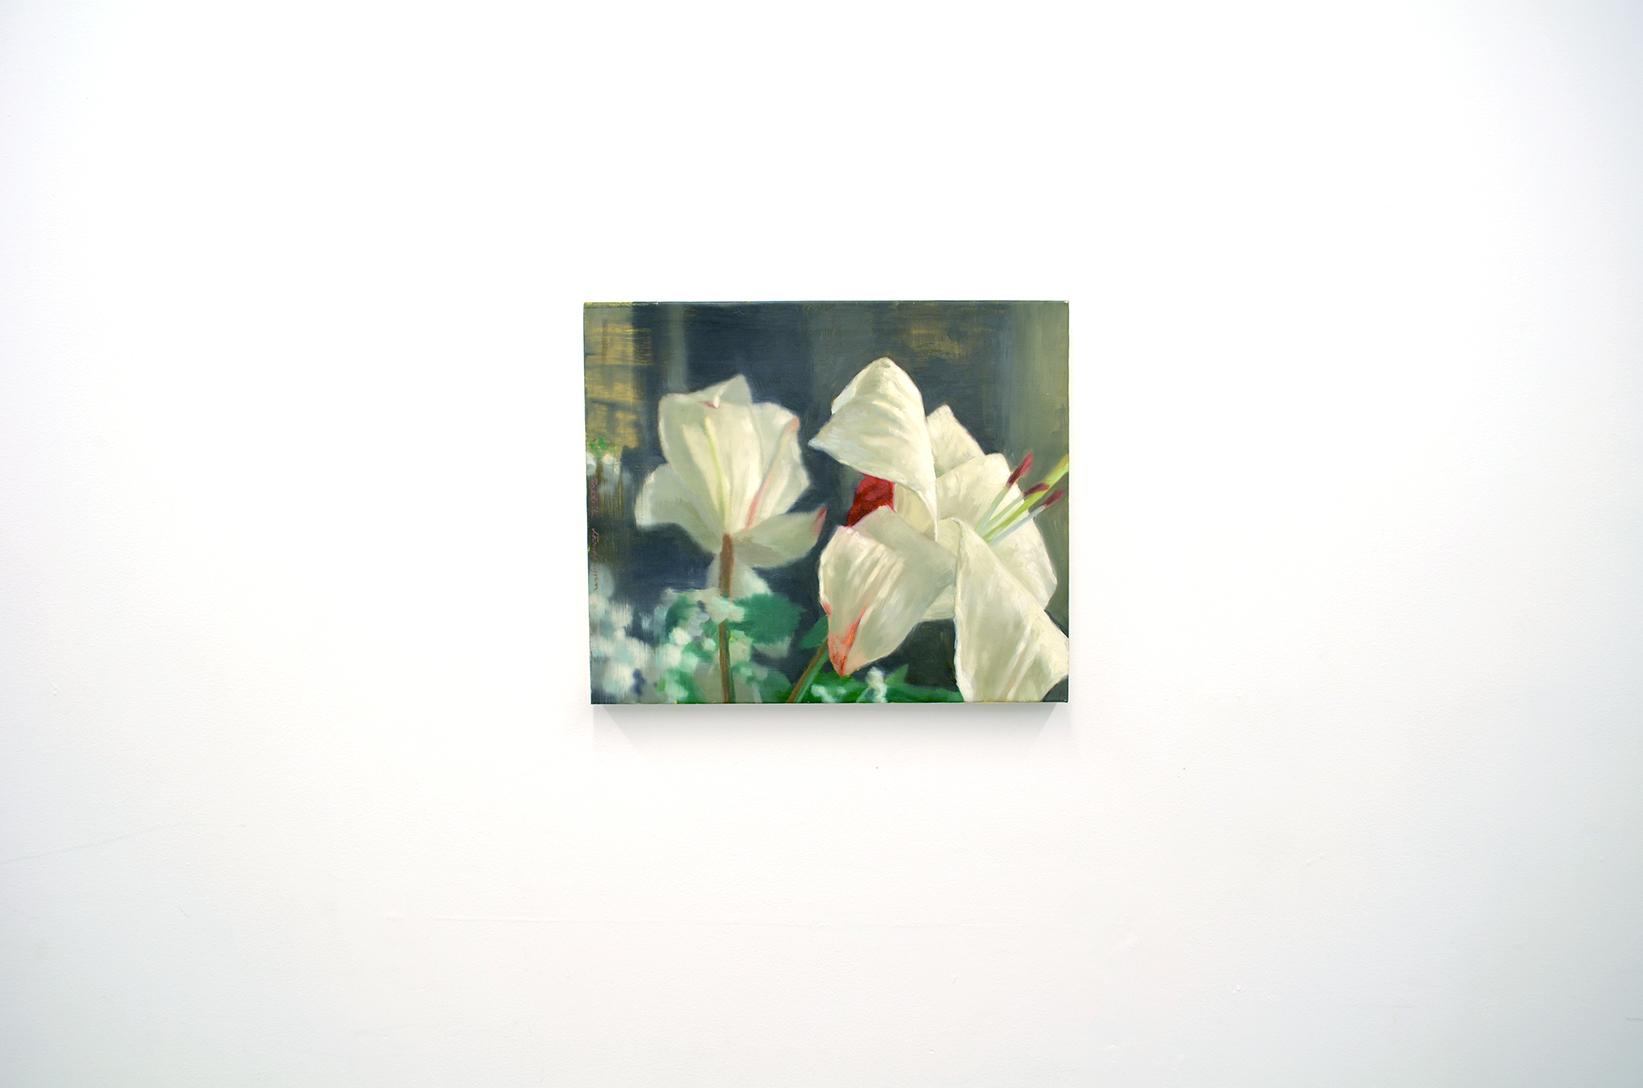 Liljor, 50 x 60 cm